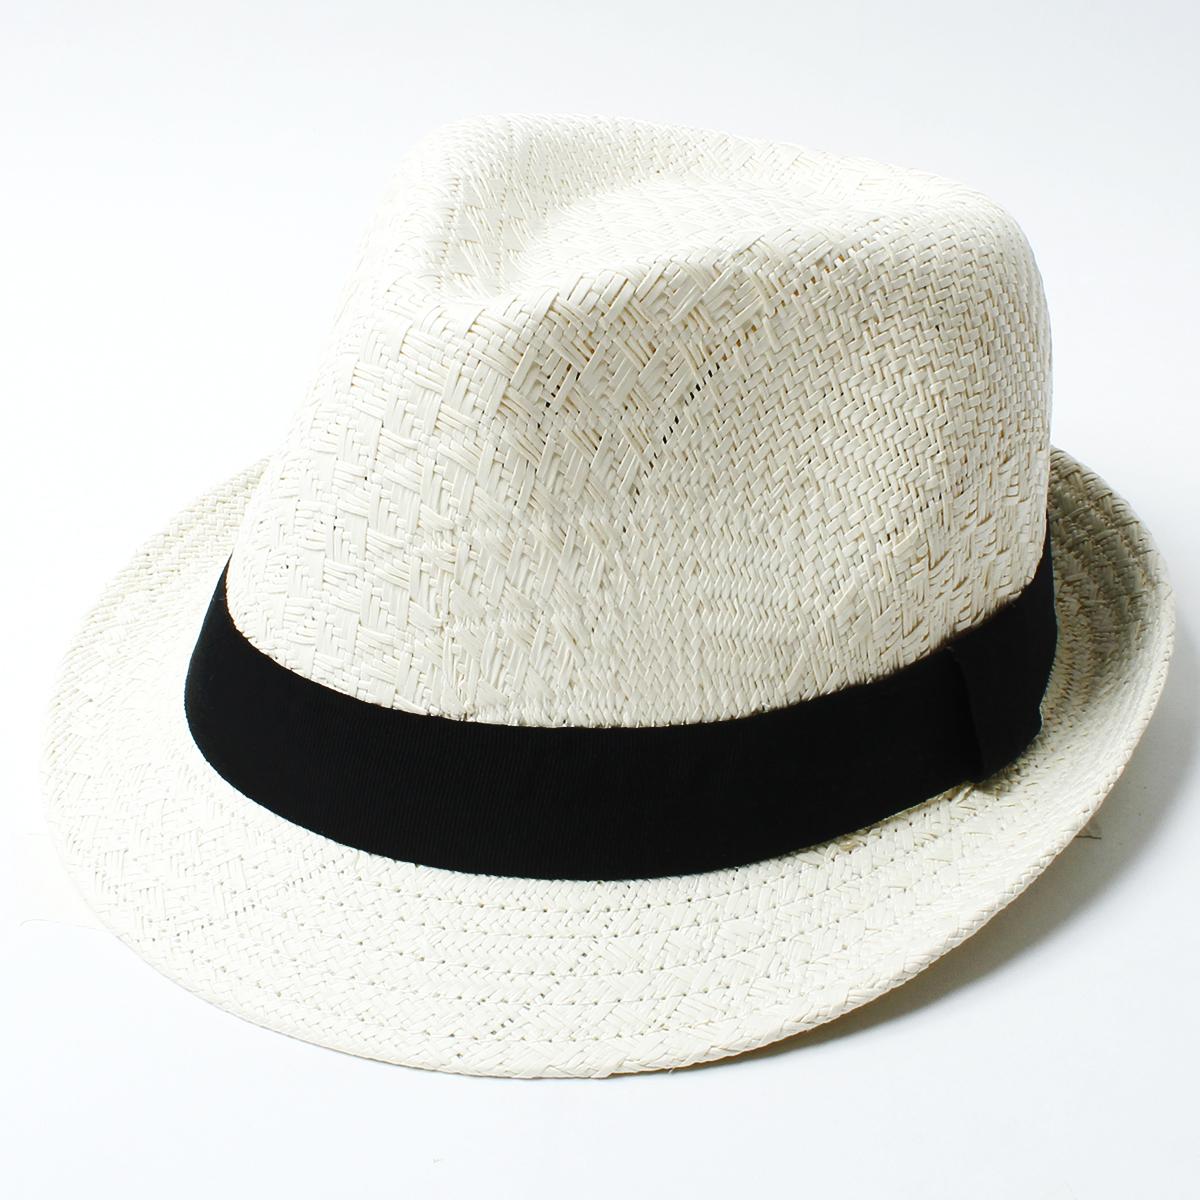 0cbb00568a2 Men S Sun Hats Target - Hat HD Image Ukjugs.Org